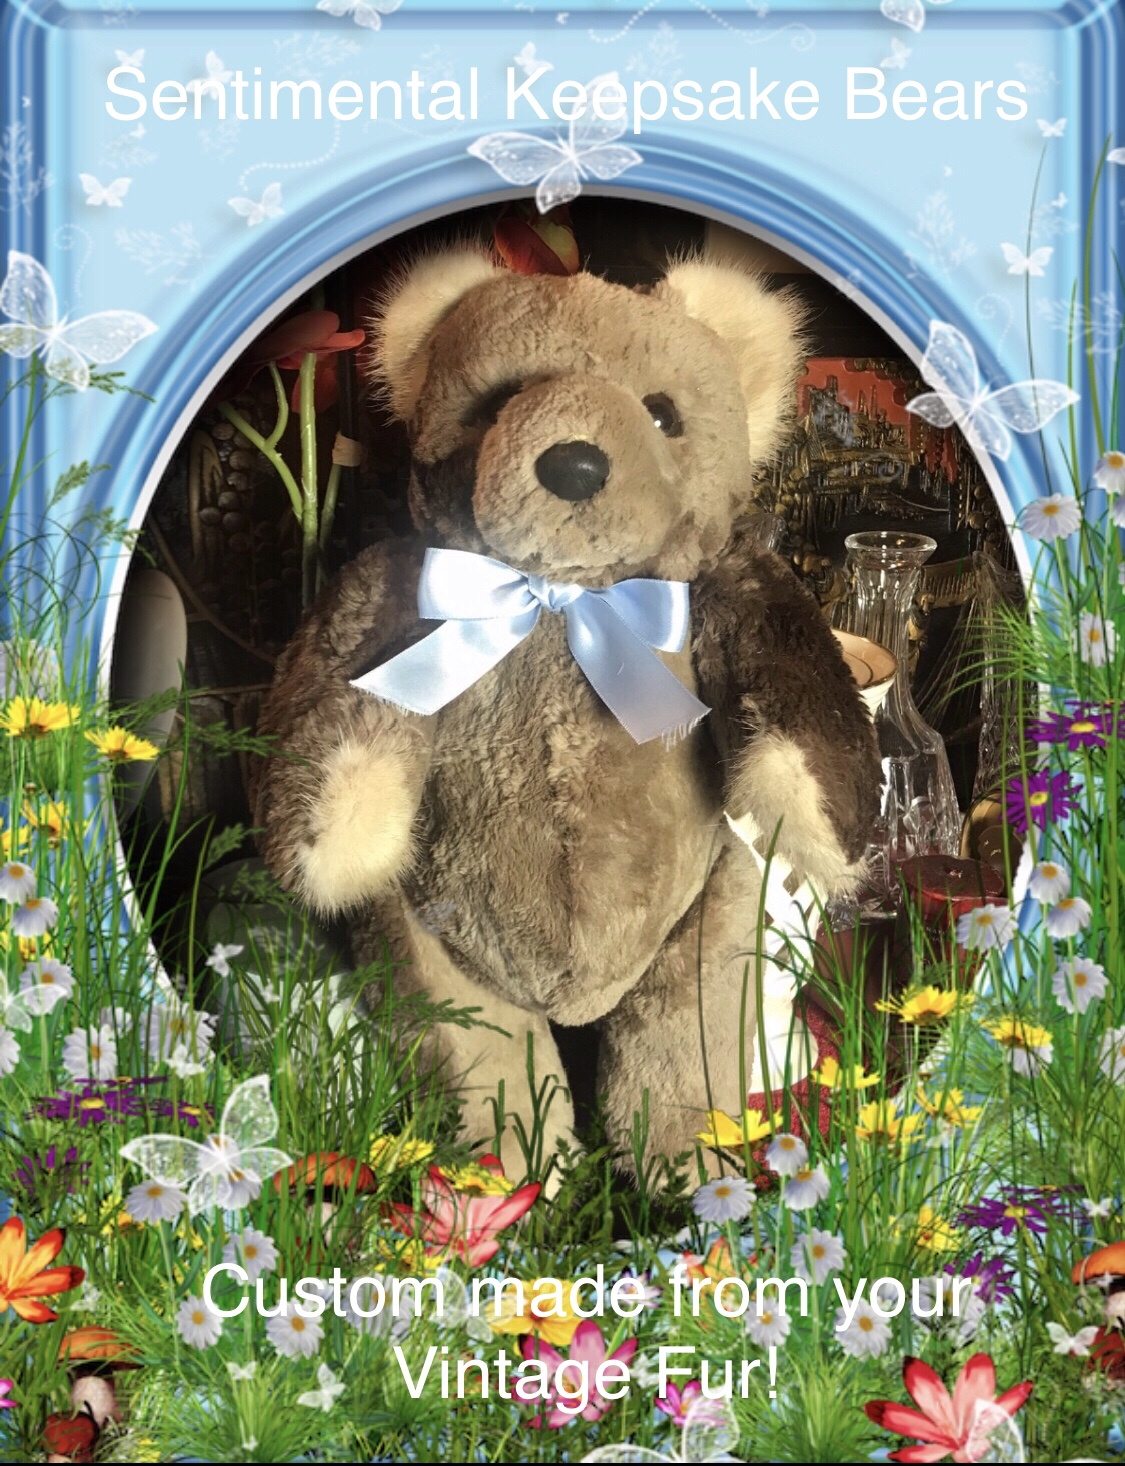 Sheared Phantom Beaver Coat restyled into a wonderful Sentimental Keepsake!